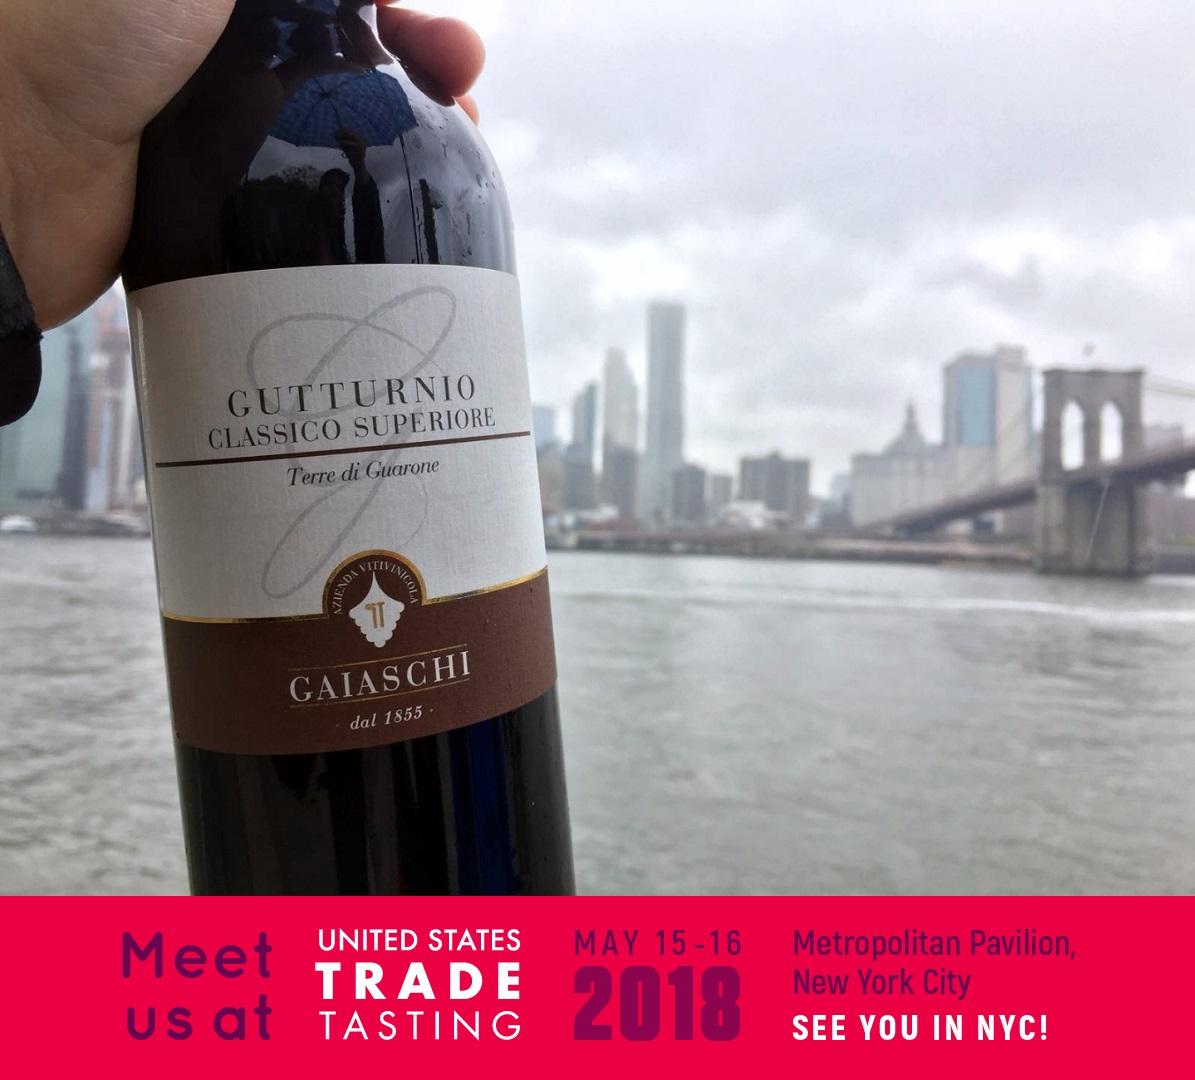 USA Trade Tasting 2018